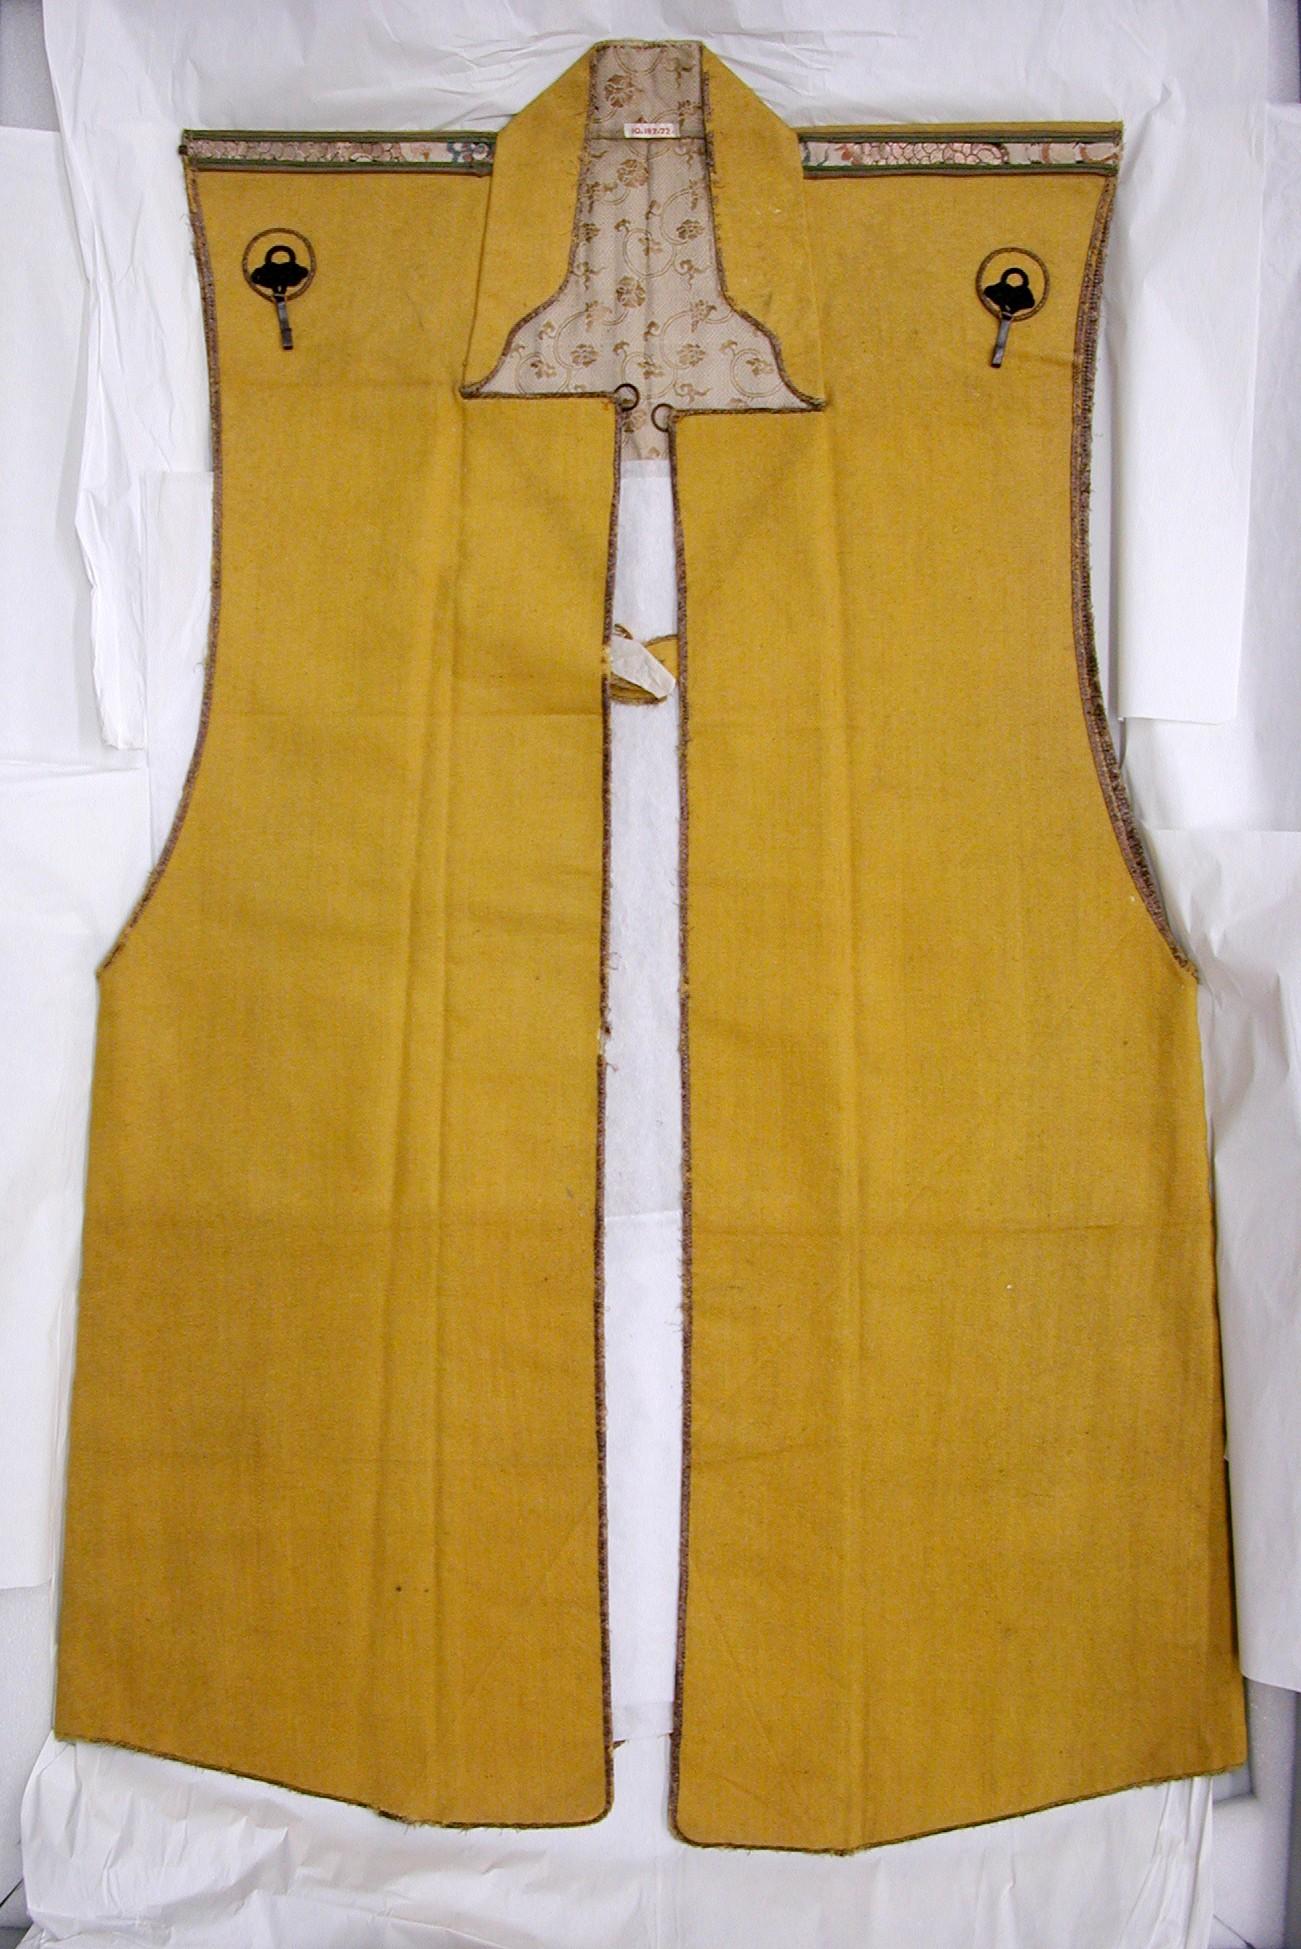 Surcoat (Jinbaori) | Japanese | The Met